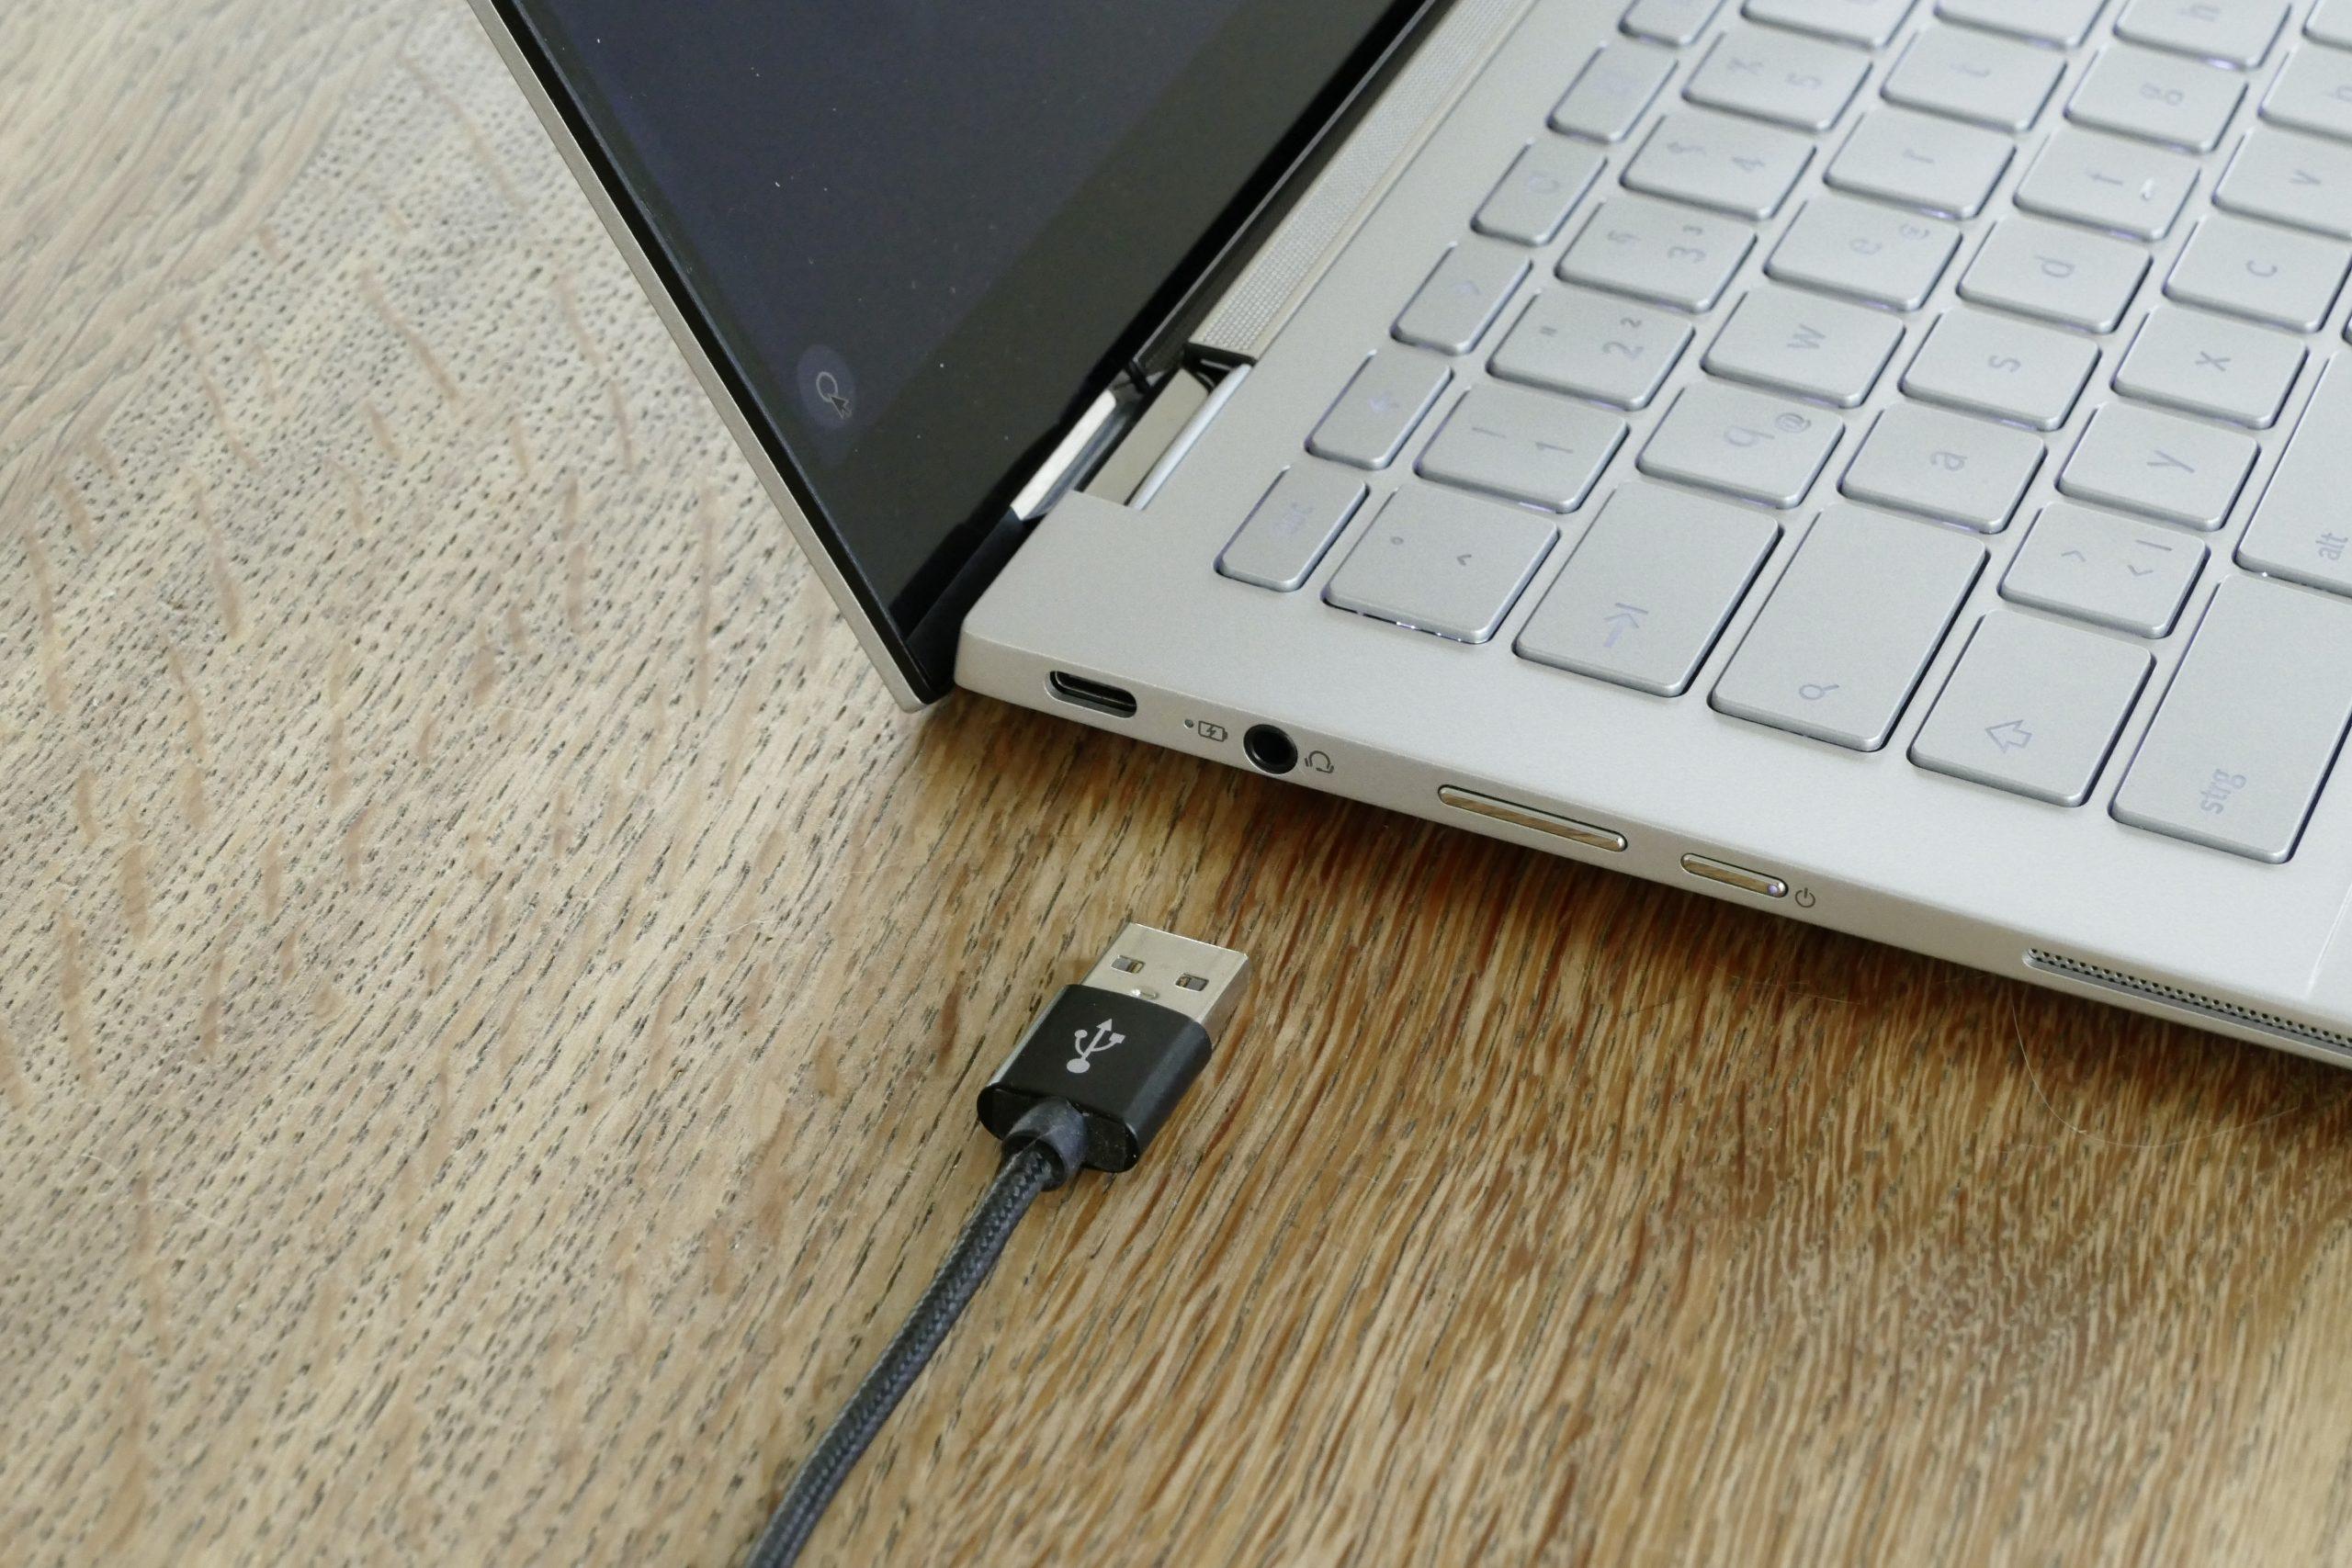 Asus Chromebook USB Kabel